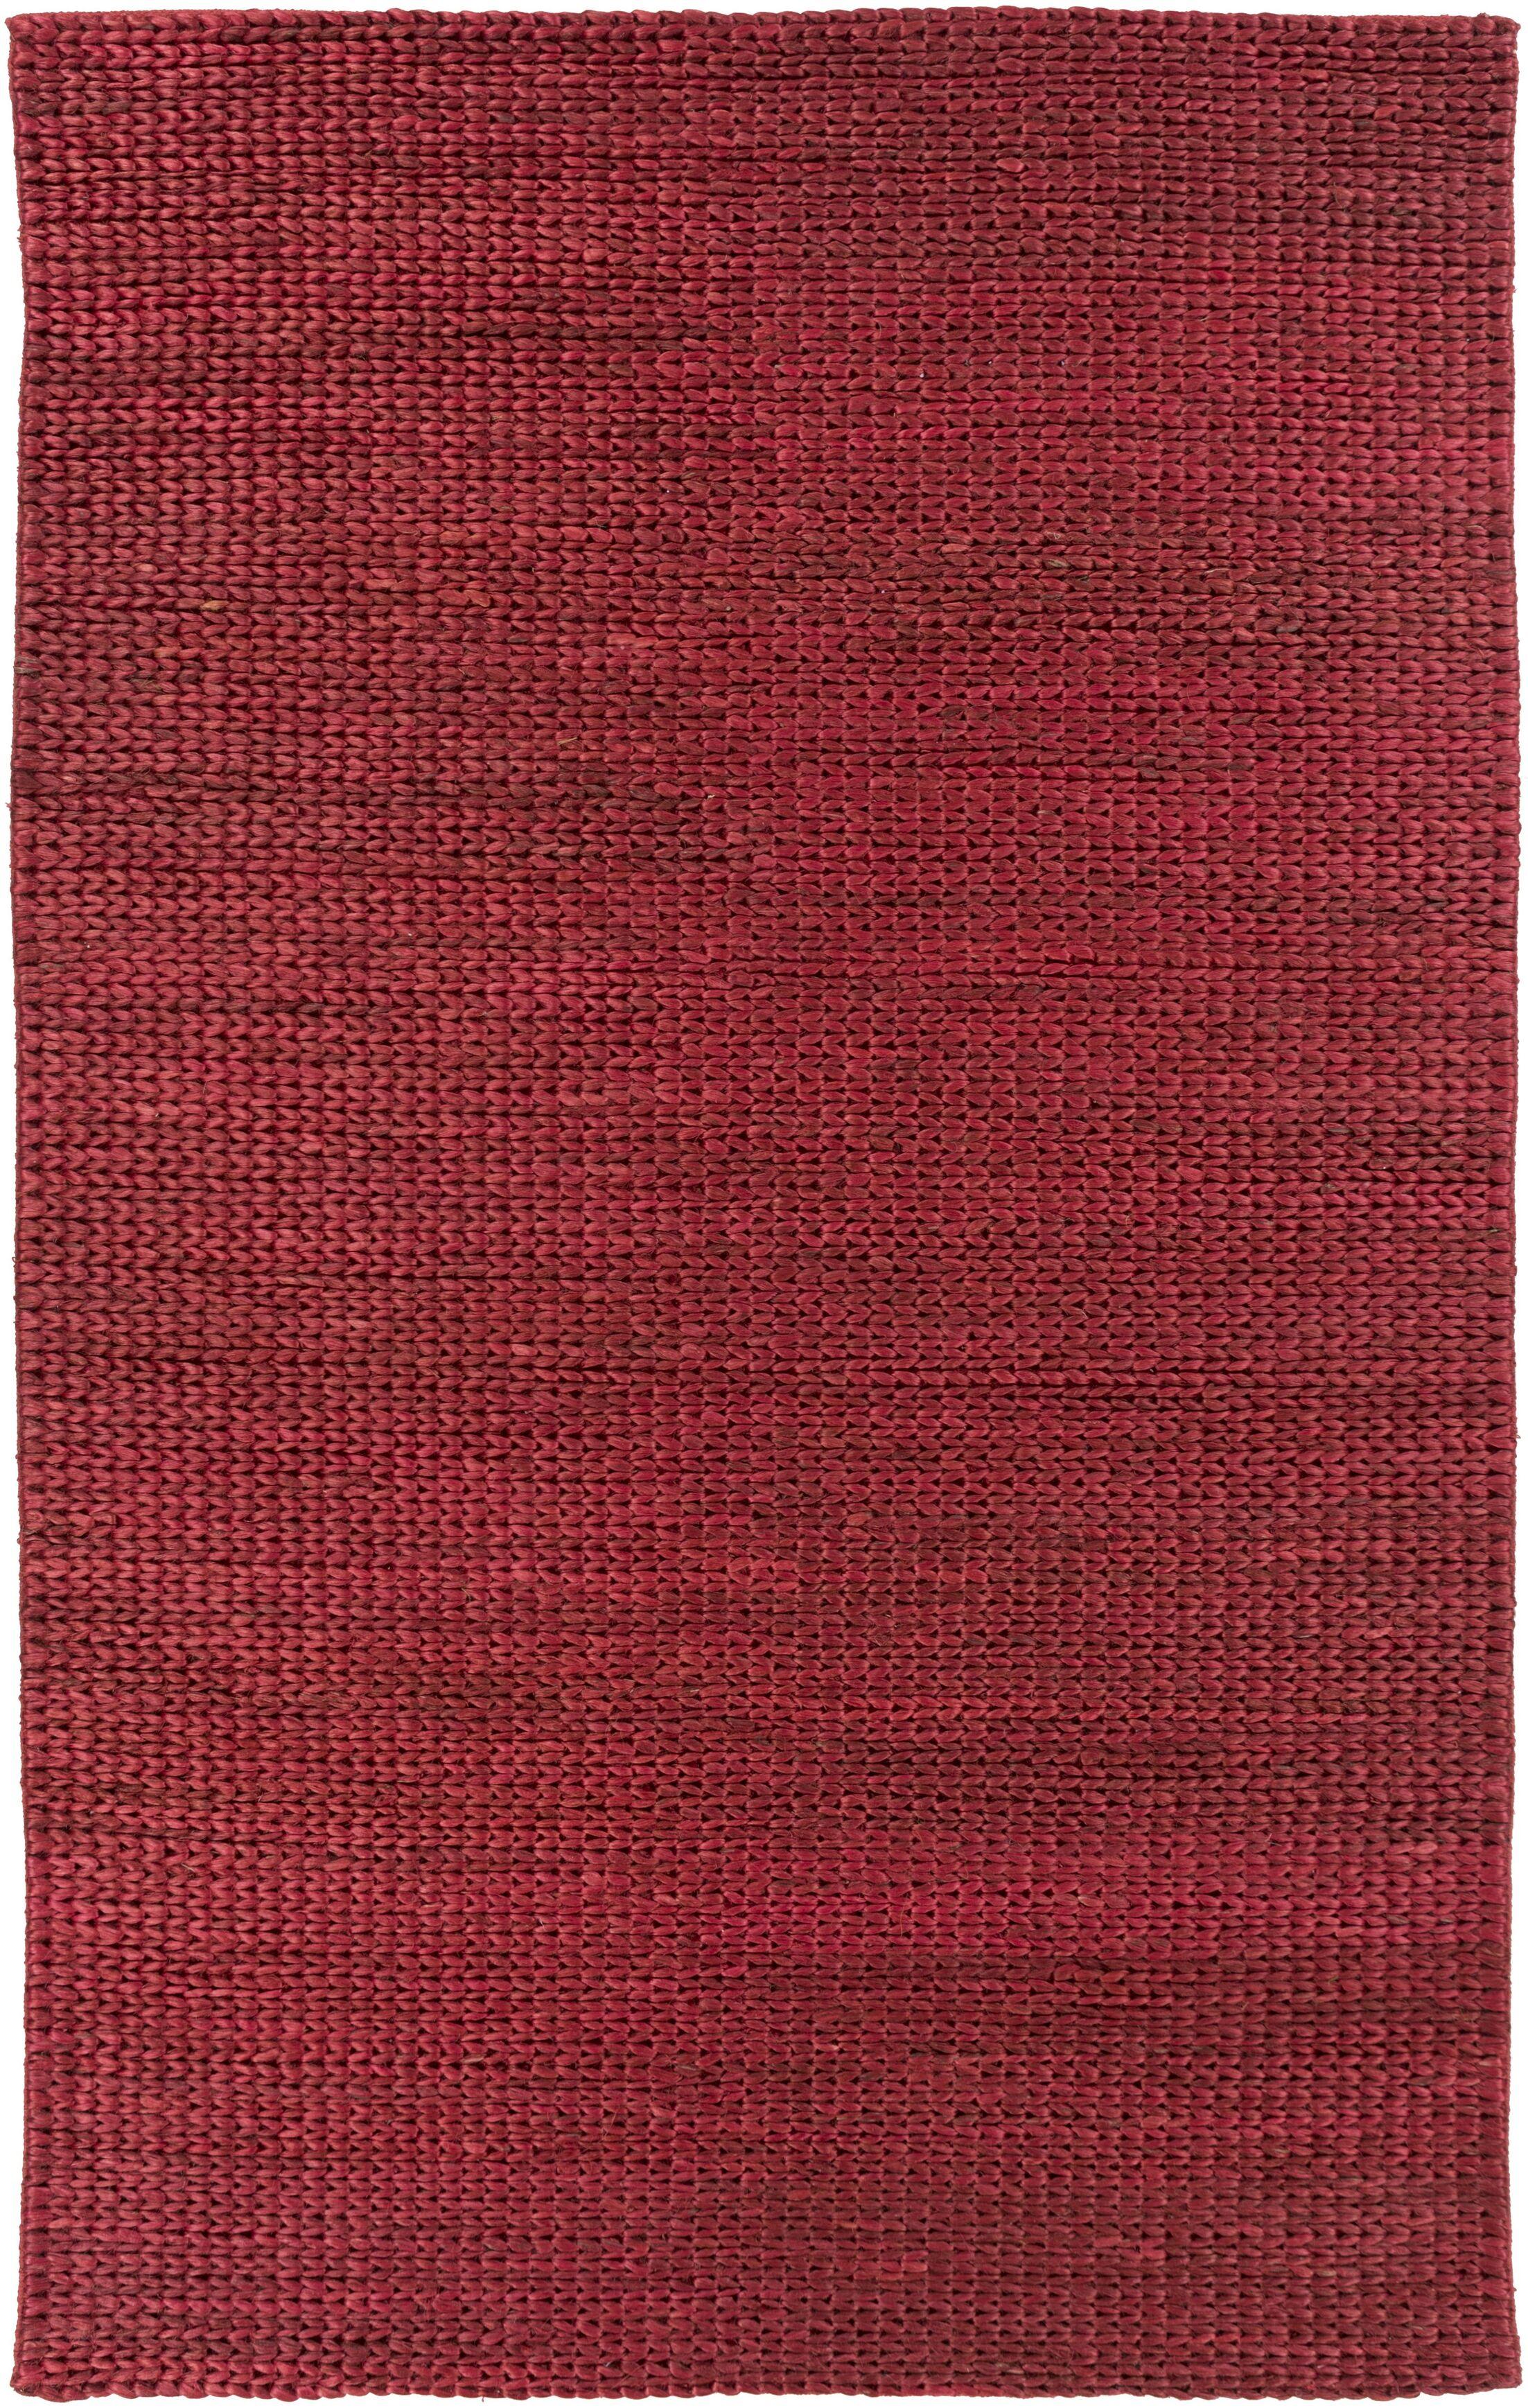 Tai Hand Woven Burgundy Area Rug Rug Size: Rectangle 5' x 8'